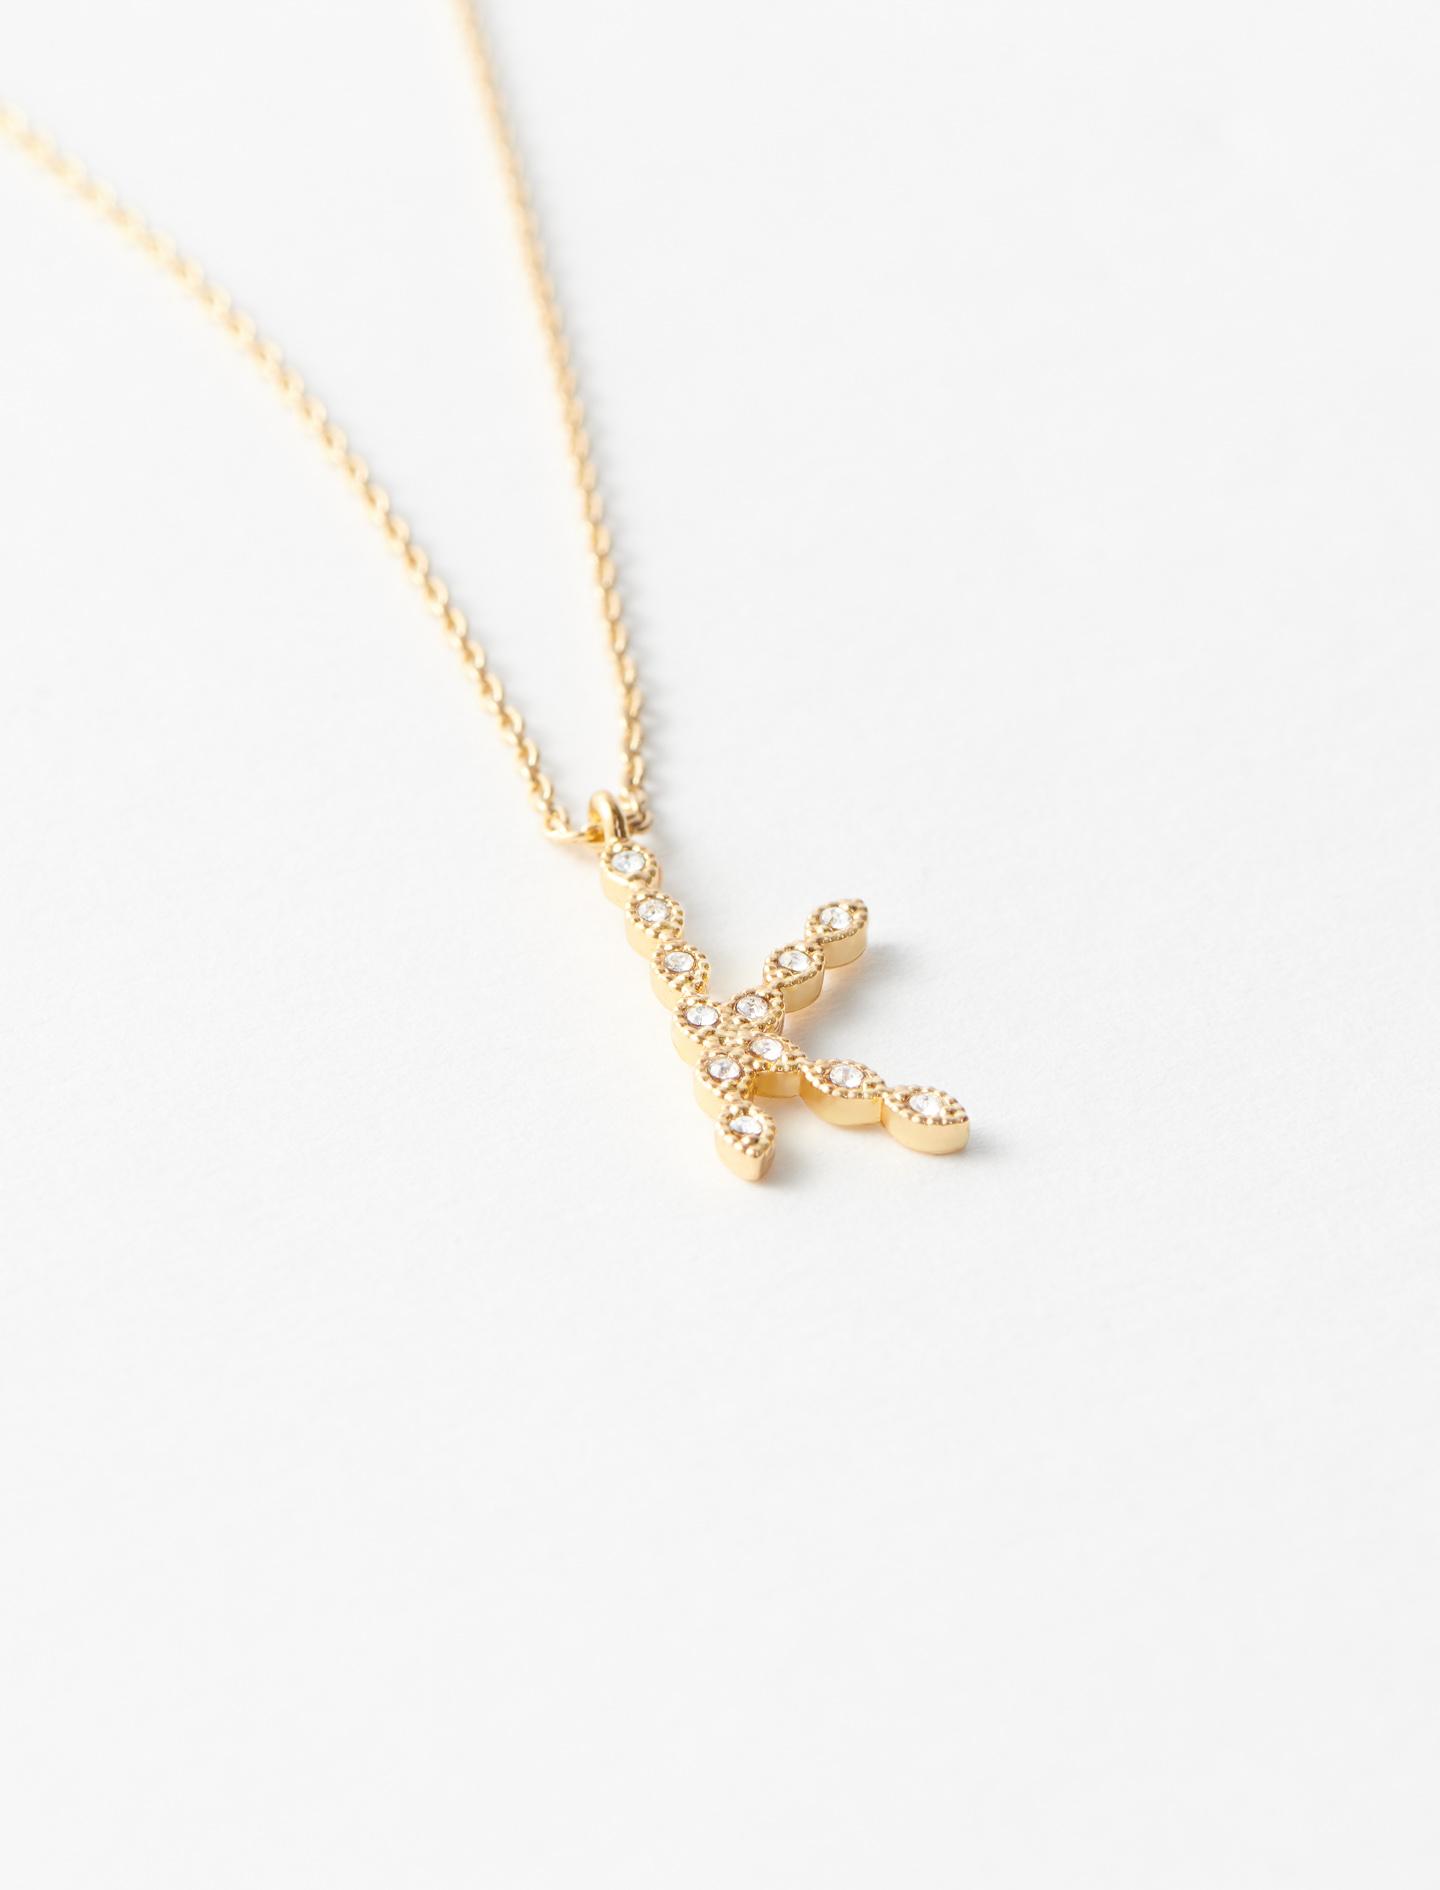 Rhinestone K necklace - Gold